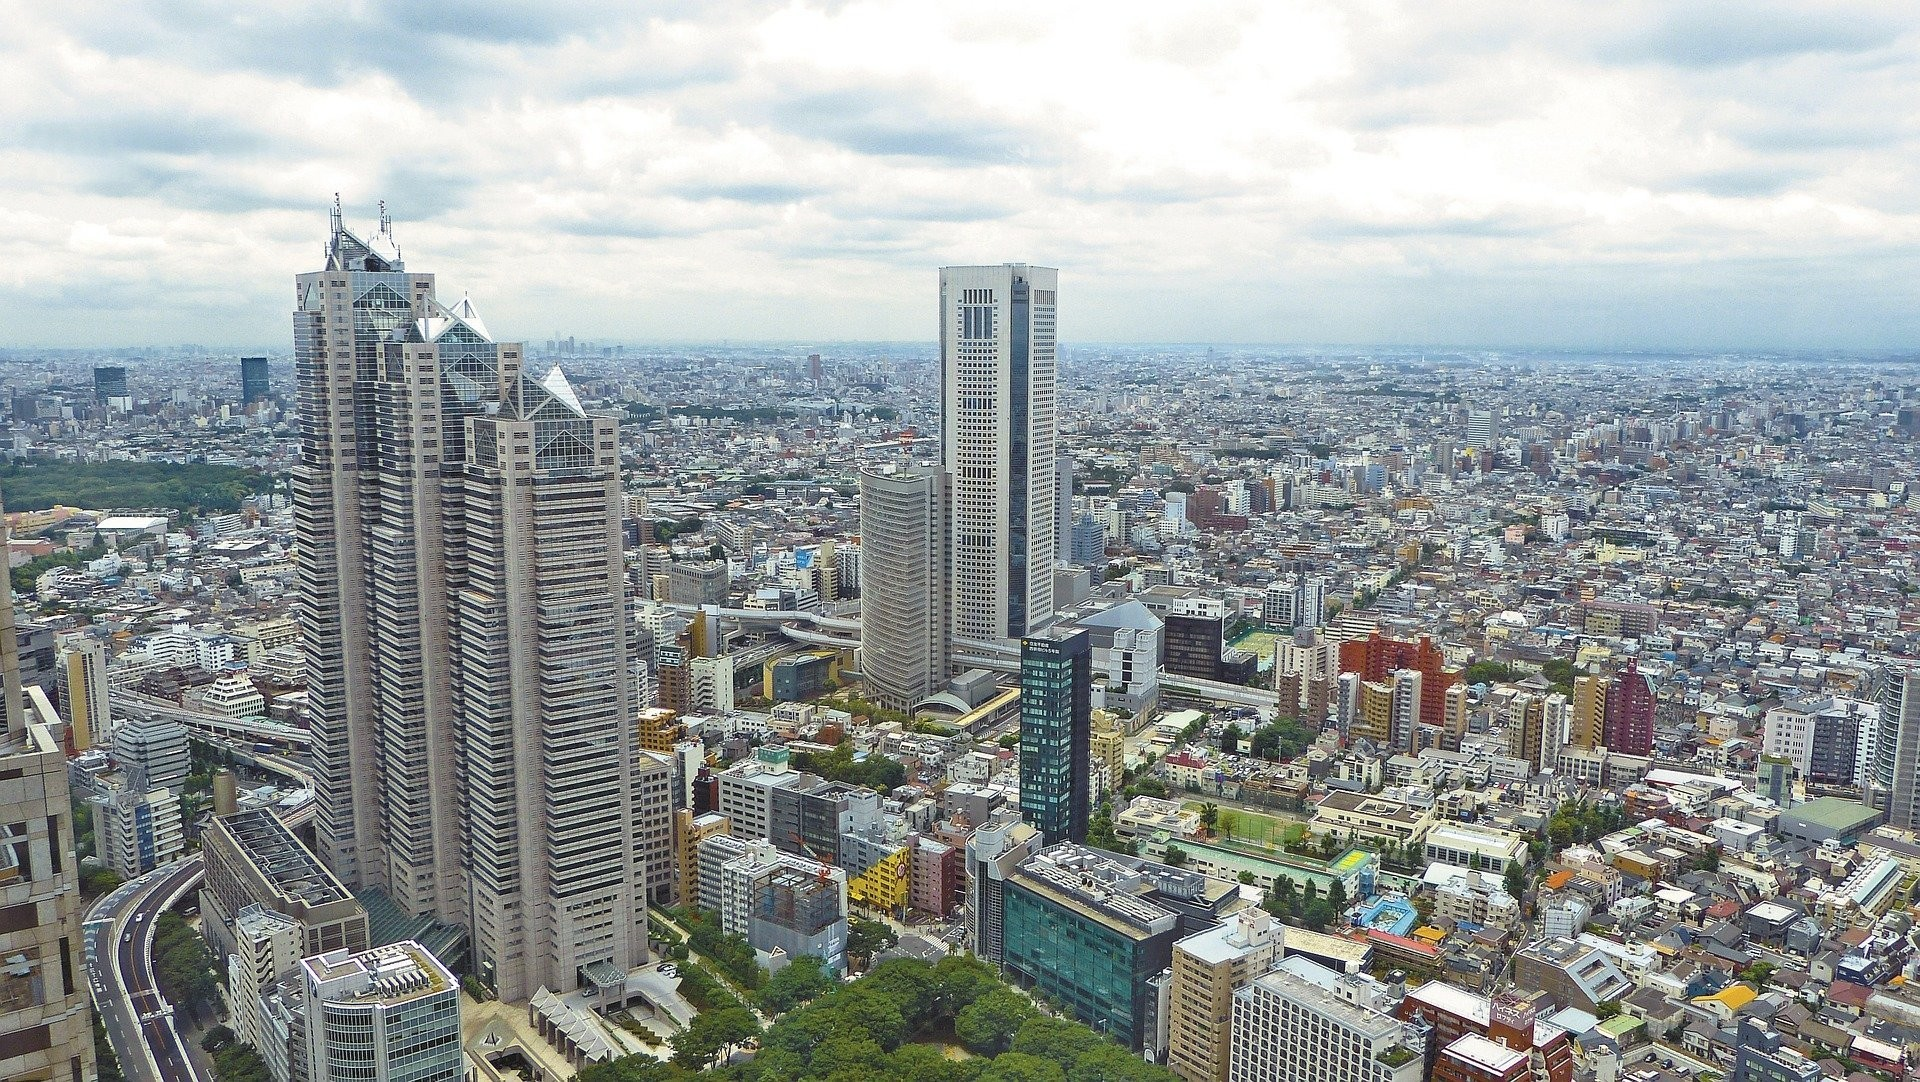 Cities urbanisation infrastructure urban fires